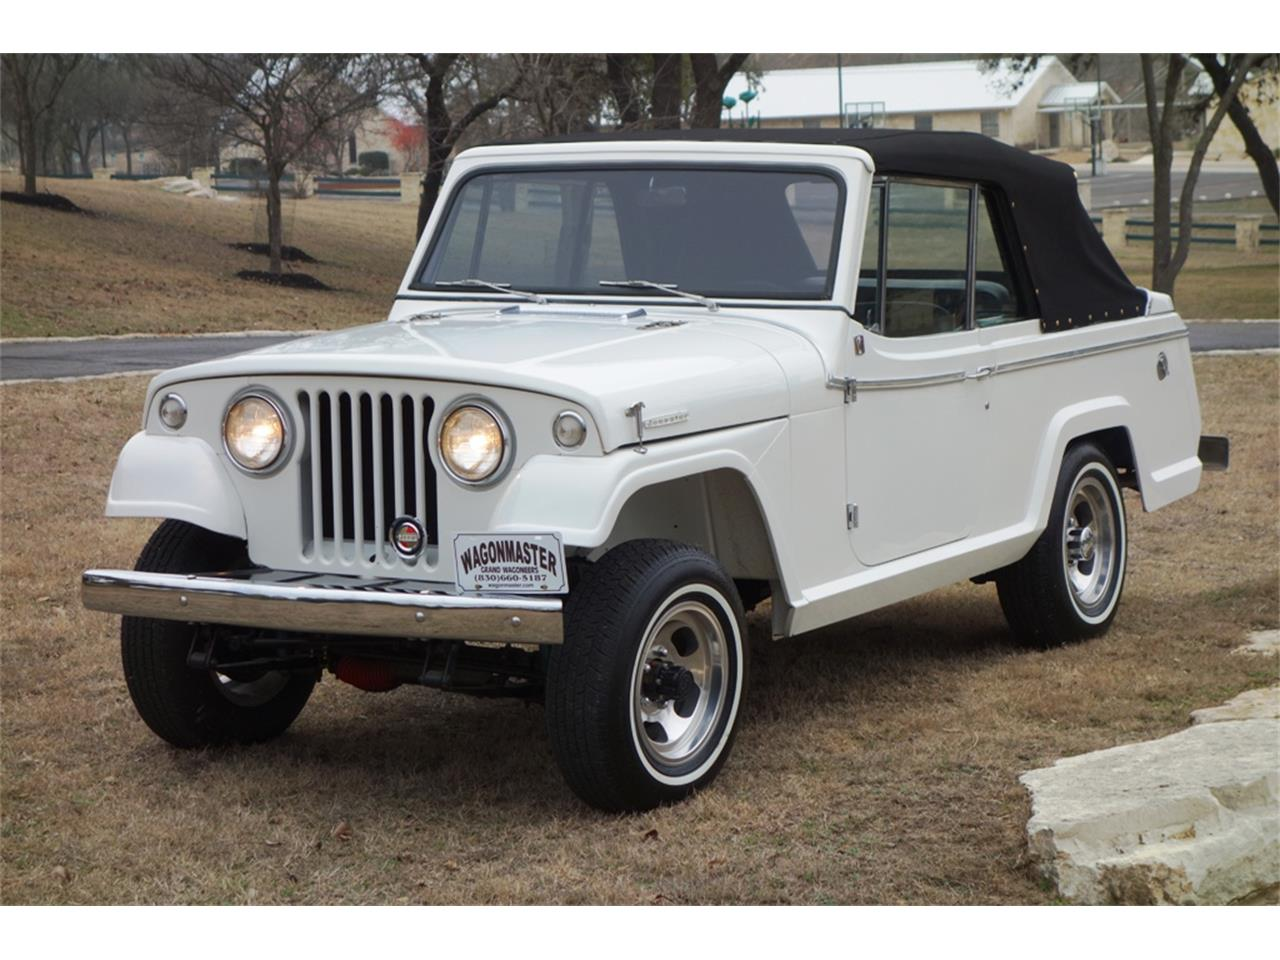 Jeep Commando For Sale >> For Sale 1968 Jeep Commando In Kerrville Texas